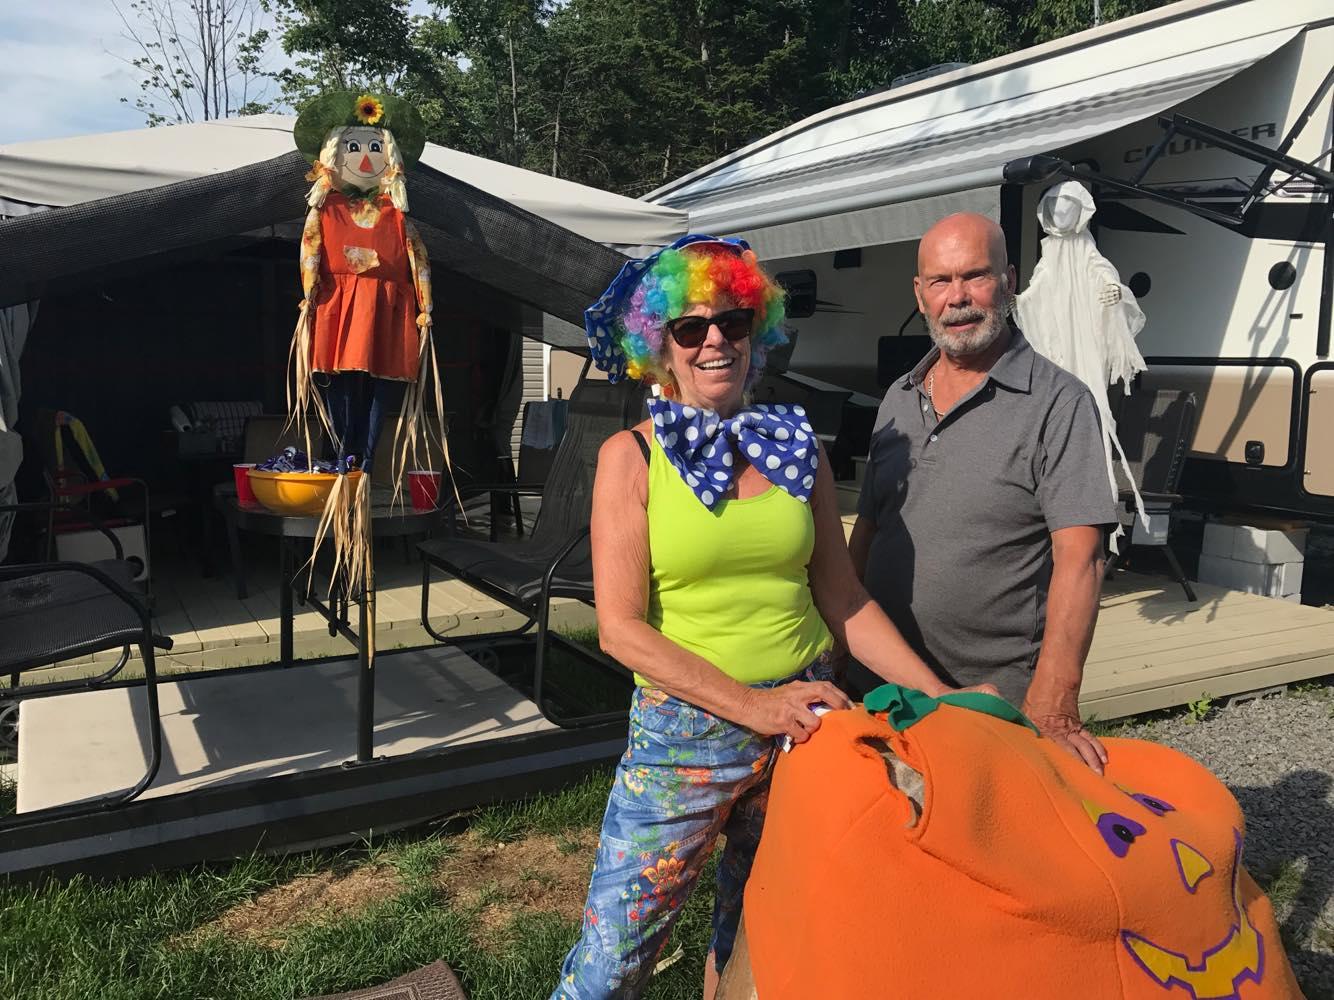 http://www.campingatlantide.com/wp-content/uploads/2018/08/halloween-complexe-atlantide.jpg